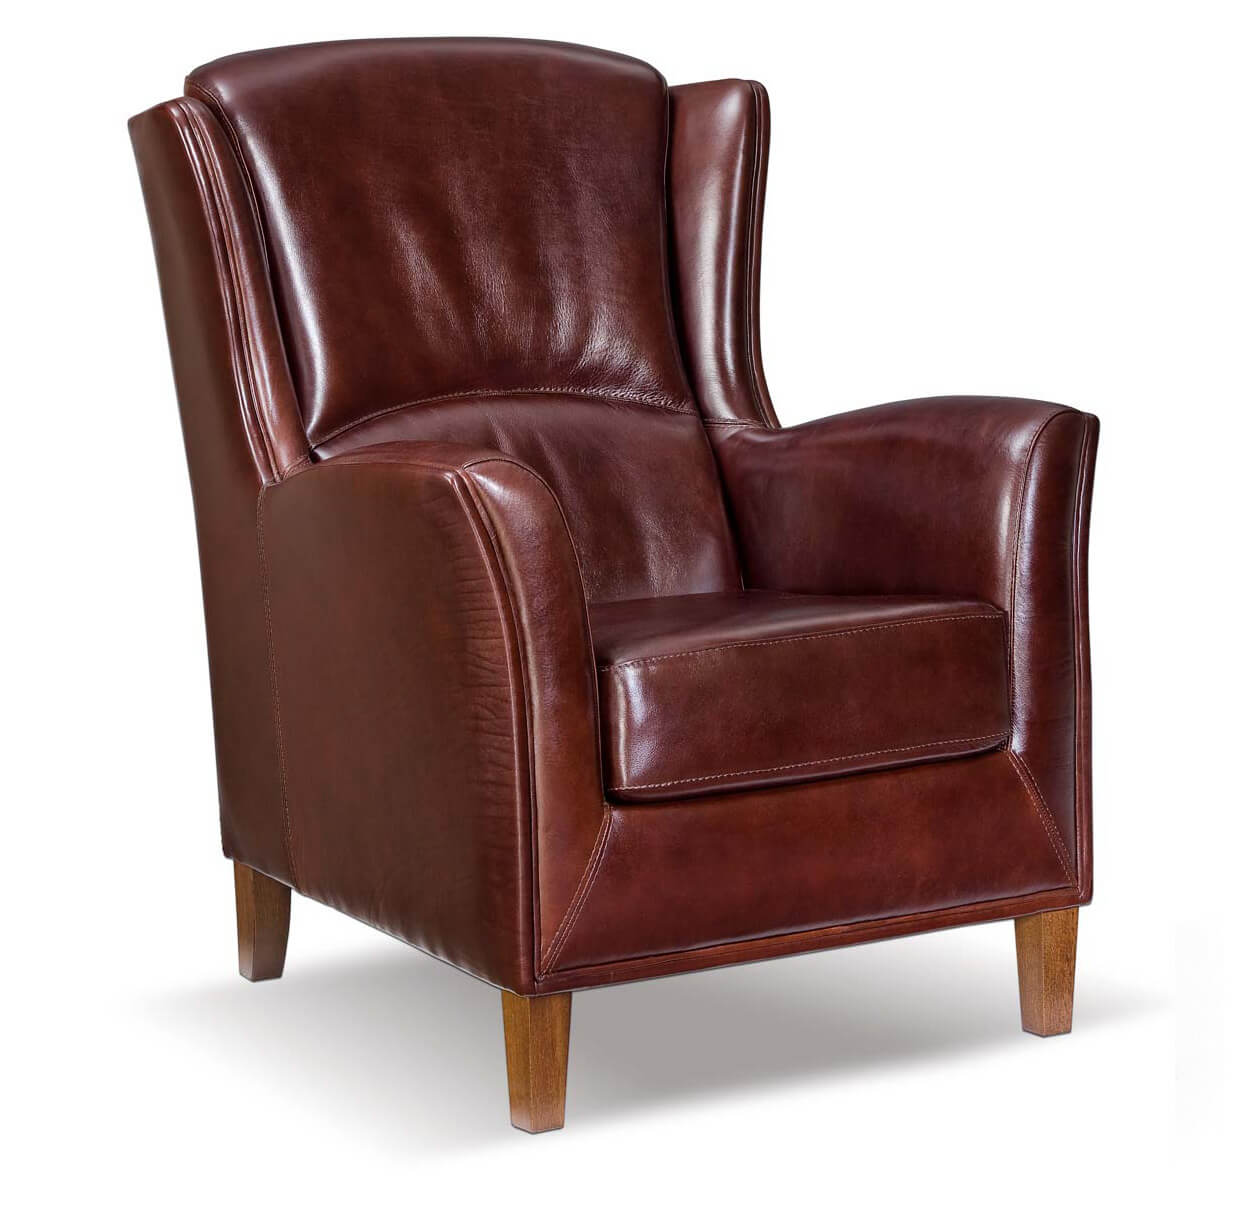 El Paso Fauteuil - Mulleman meubelen